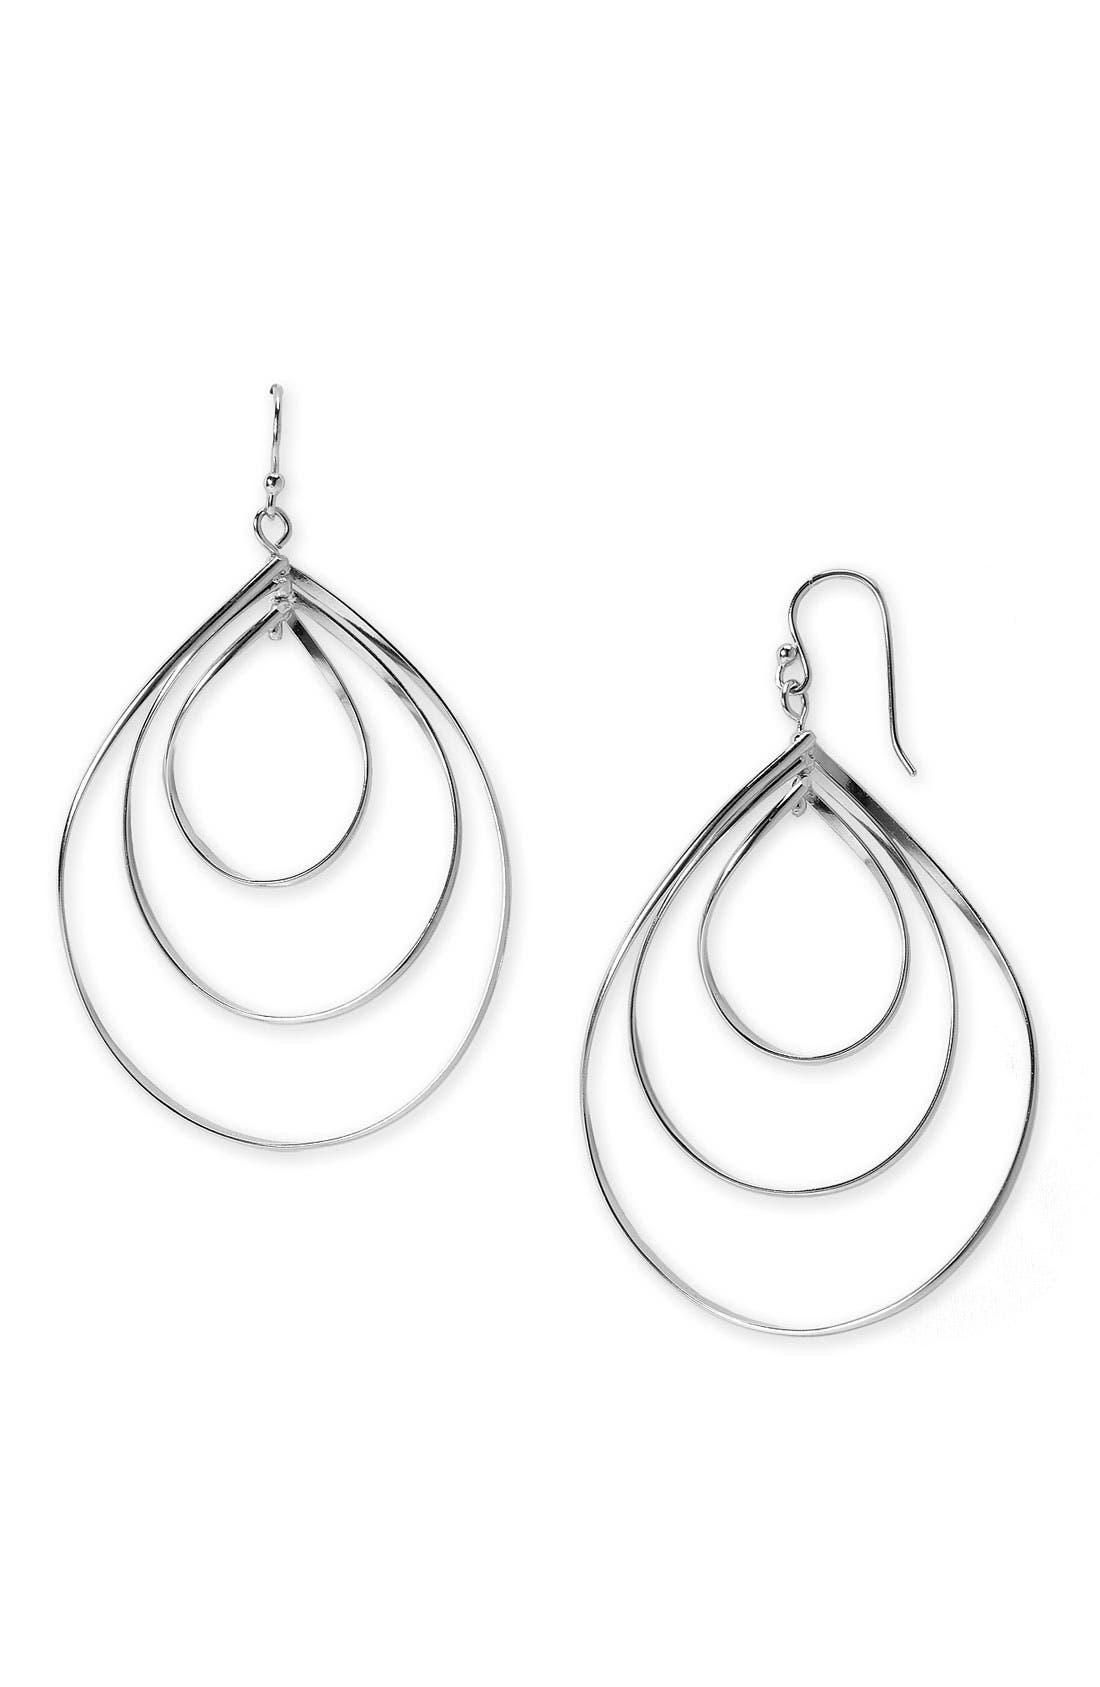 Alternate Image 1 Selected - Argento Vivo Triple Teardrop Earrings